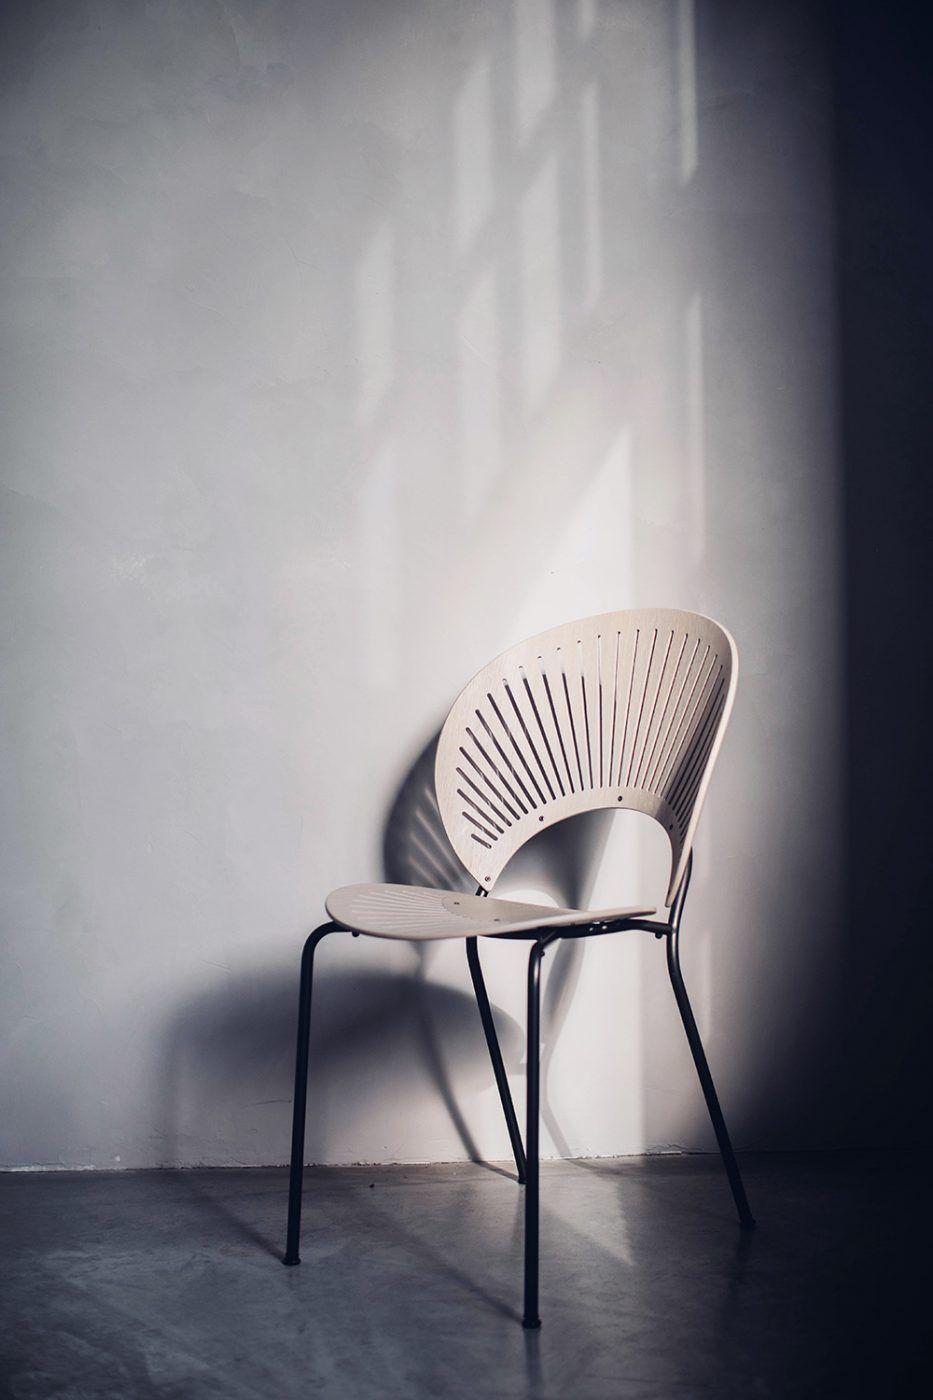 Concrete interiors grey oak steel frame trinidad interior design photo also pin by inna nikitina on to draw pinterest chair rh